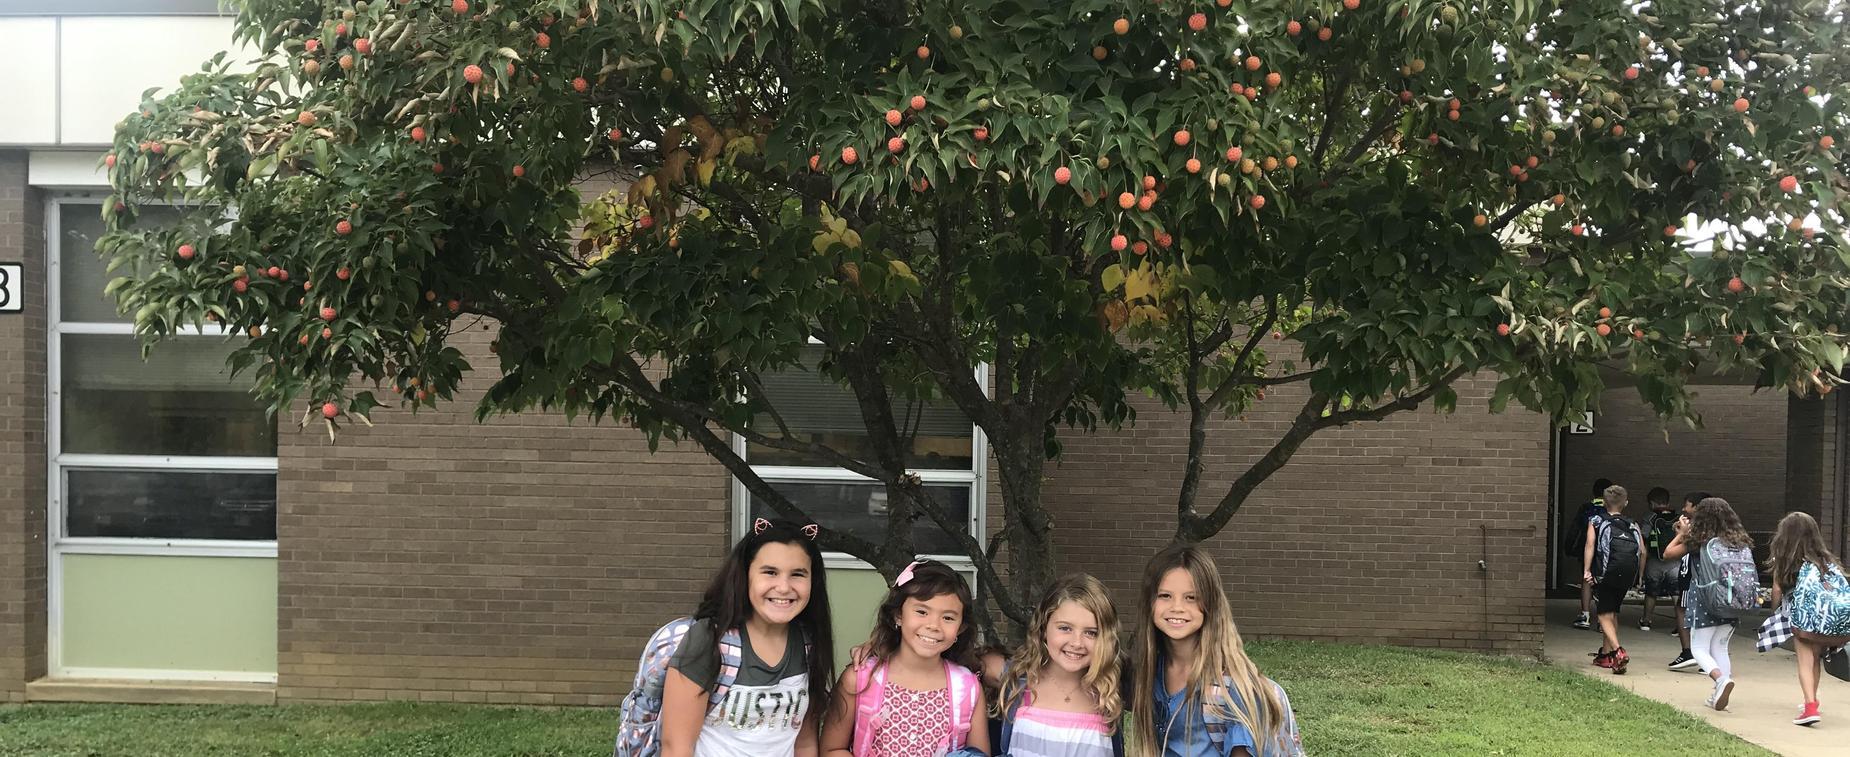 Marshall W  Errickson Elementary School